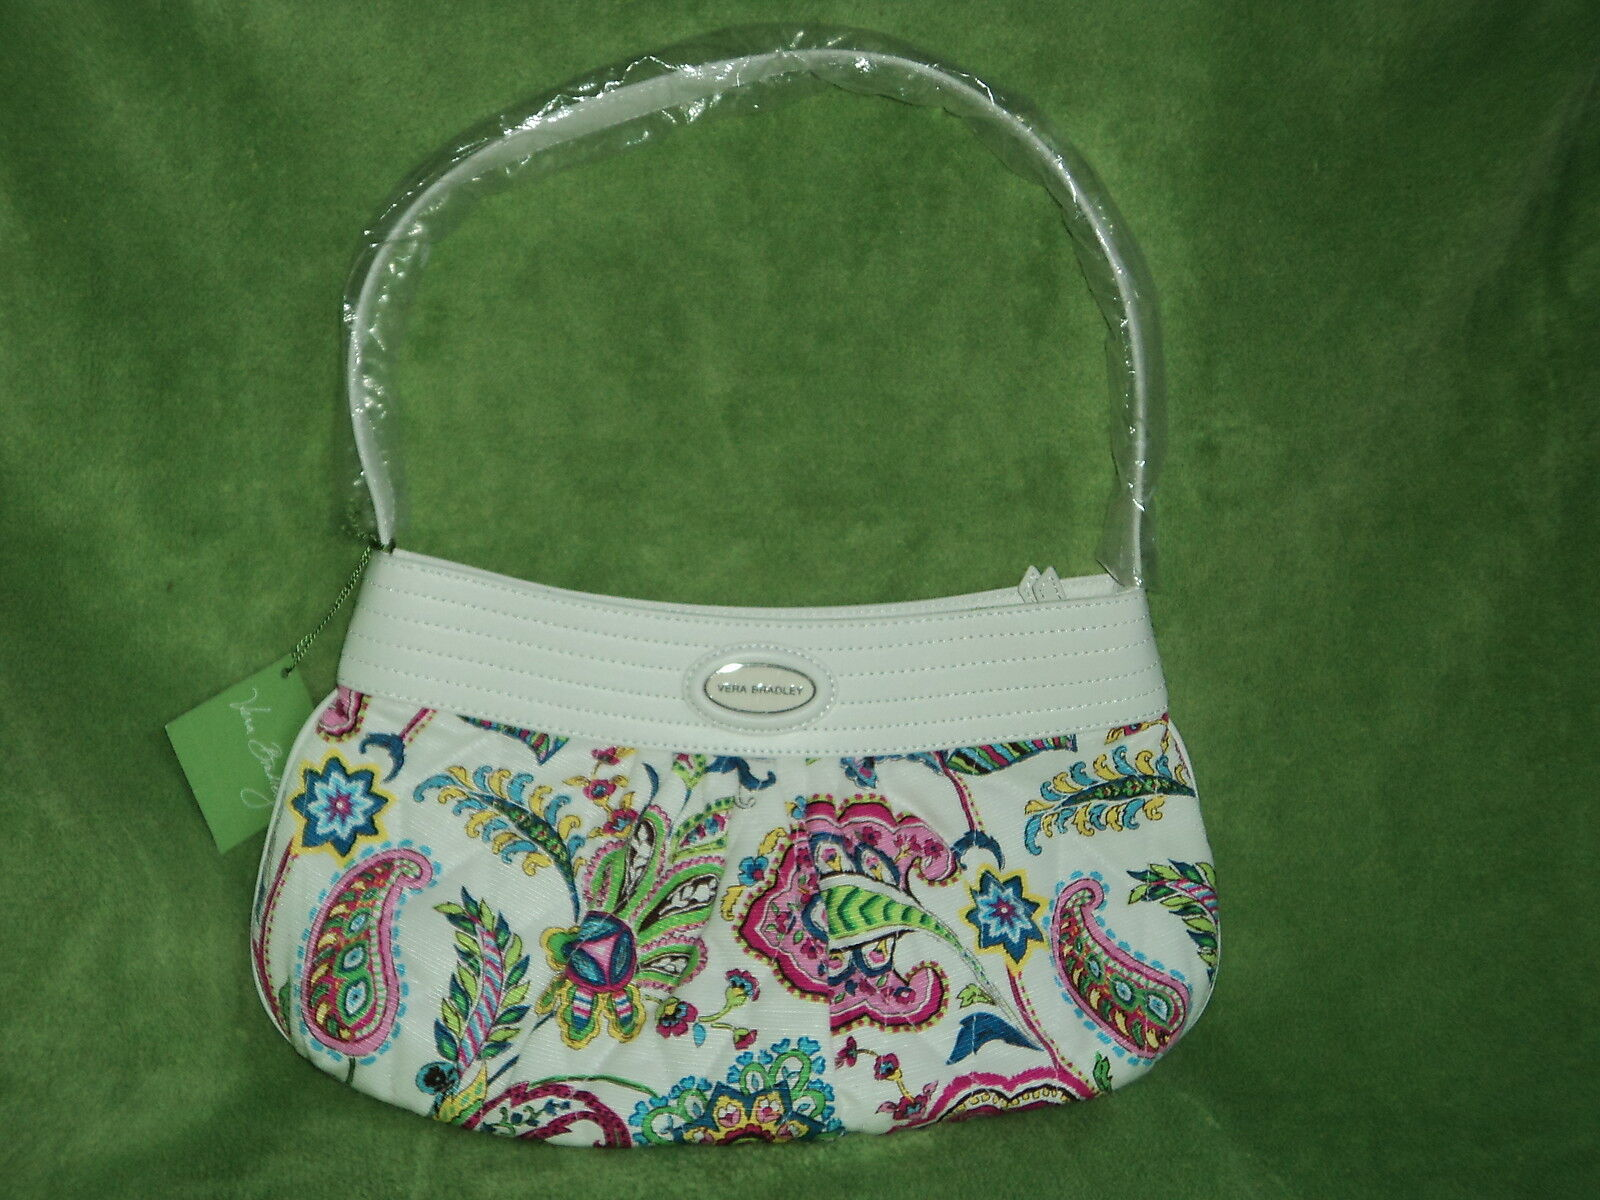 Vera Bradley Purse Tote Shoulder Bag Palm Beach Gardens | eBay